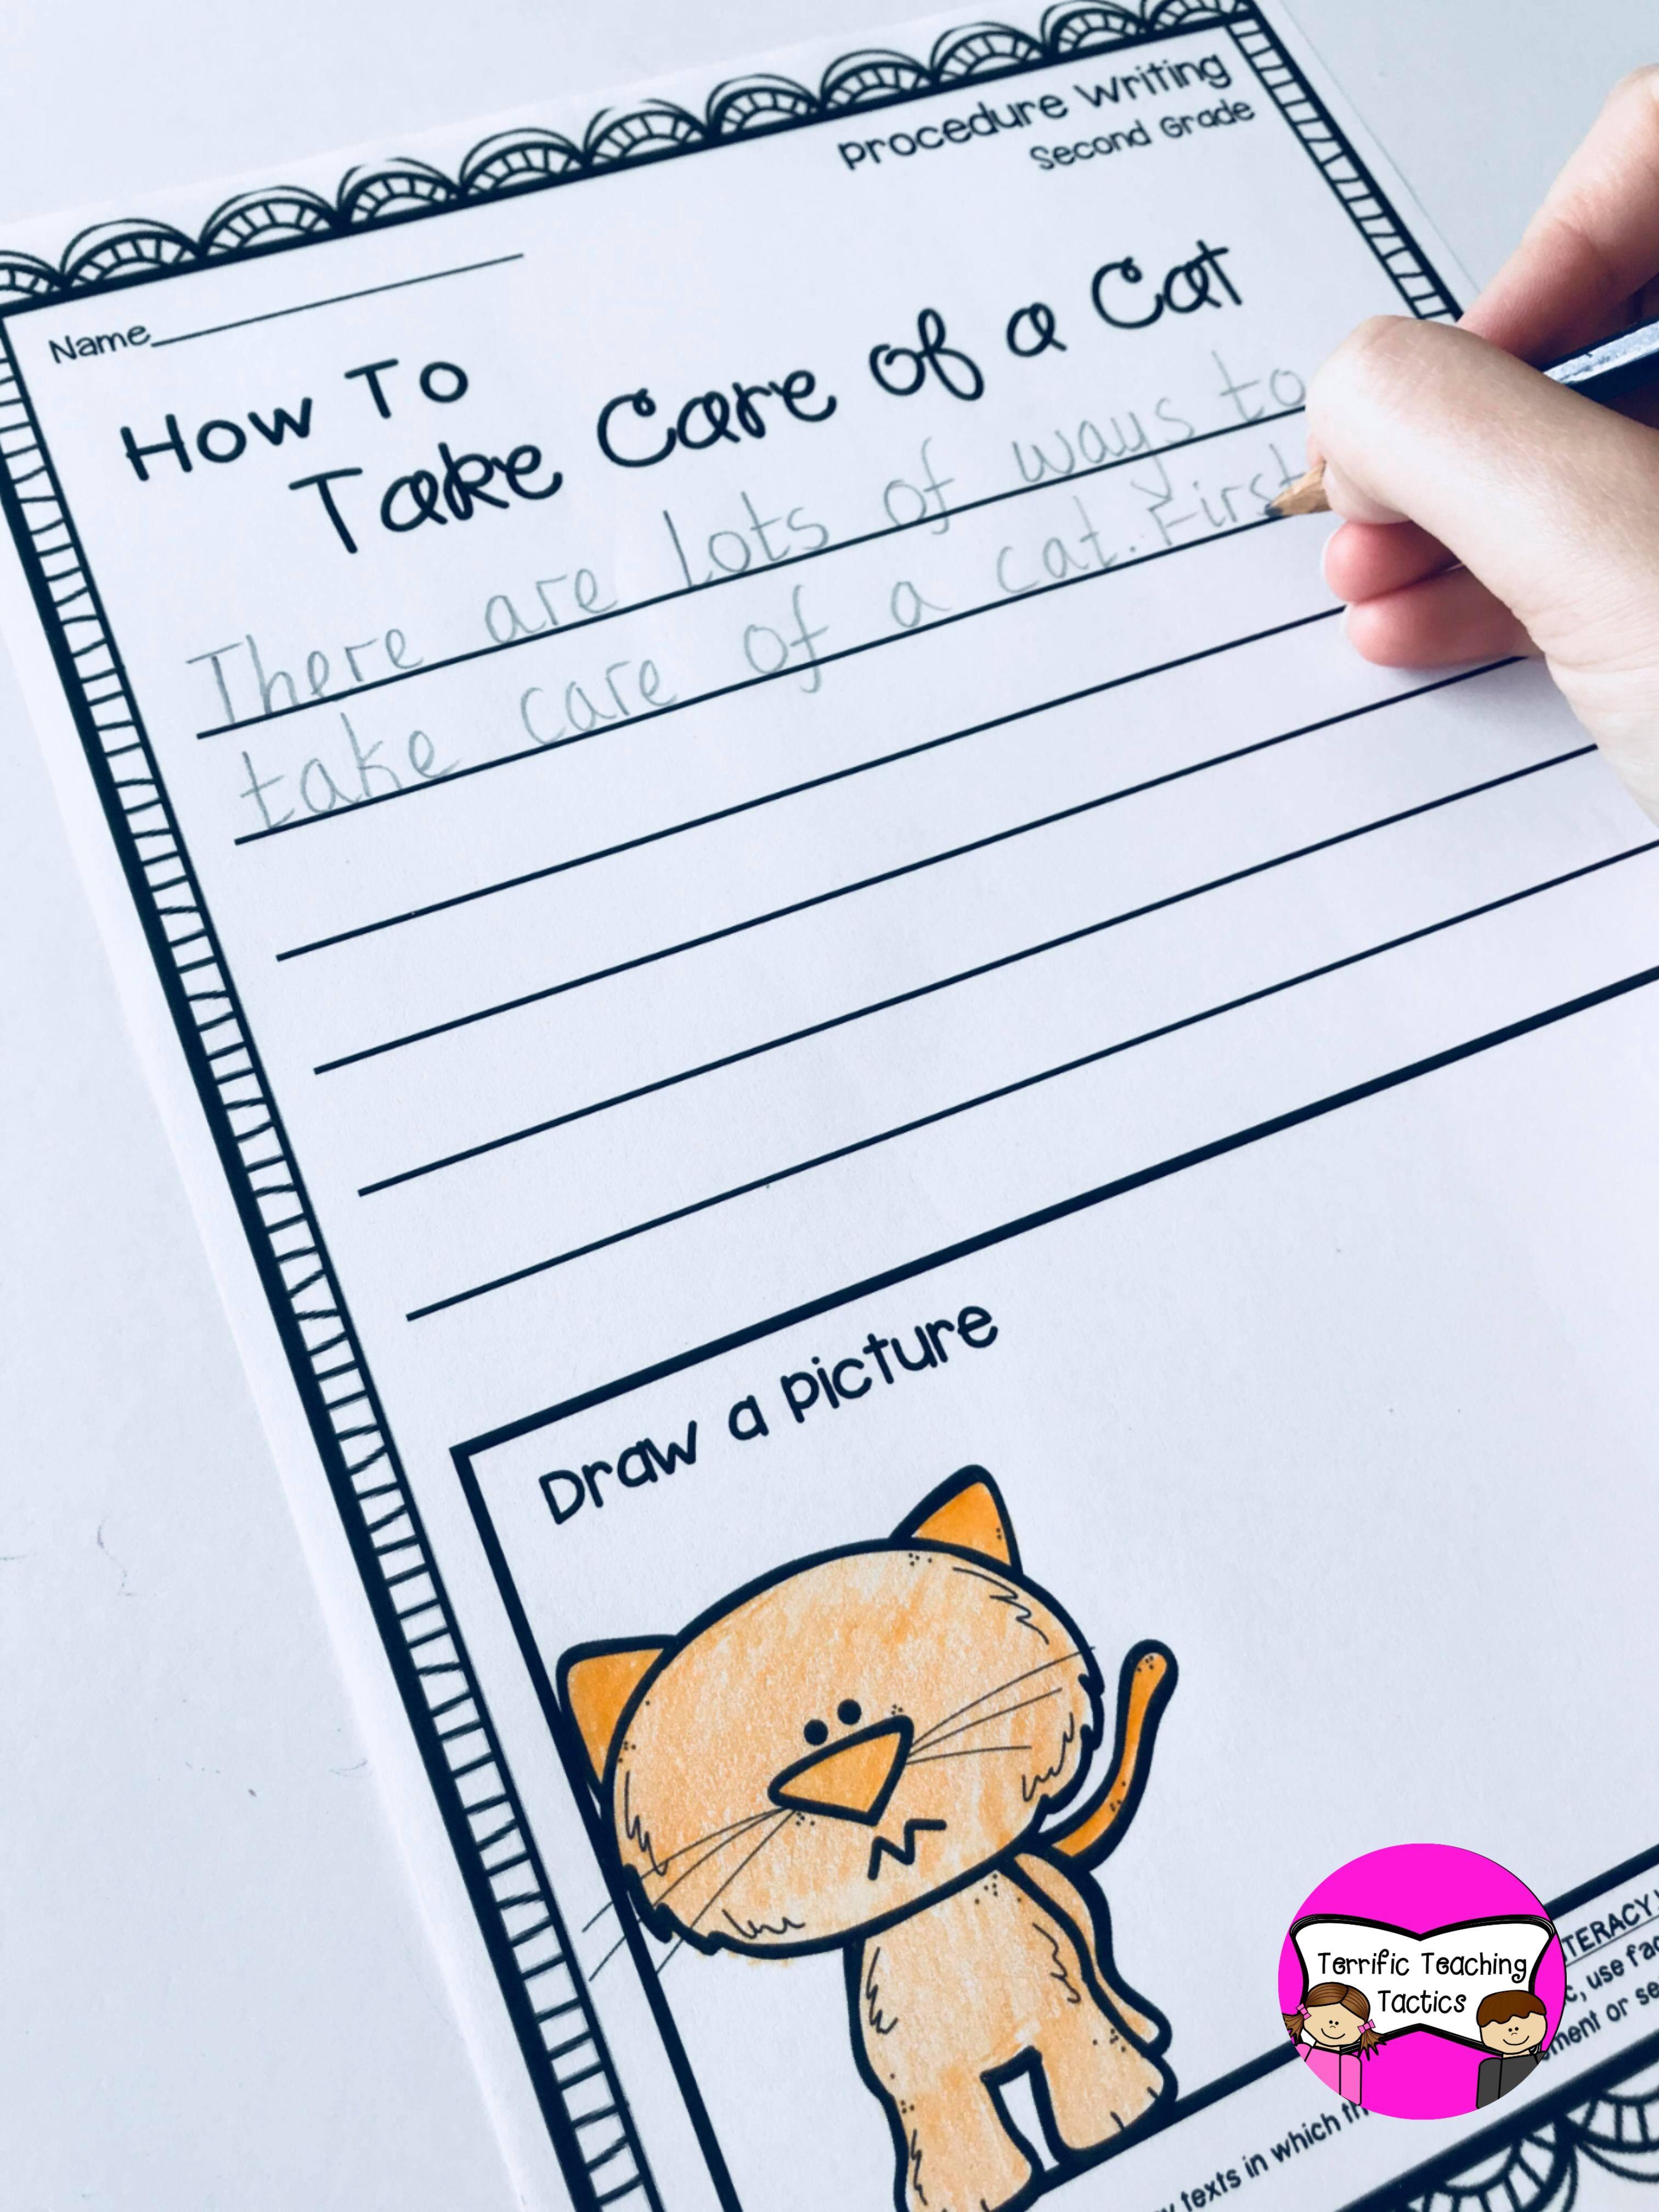 Second Grade Procedure Writing Prompts Worksheets